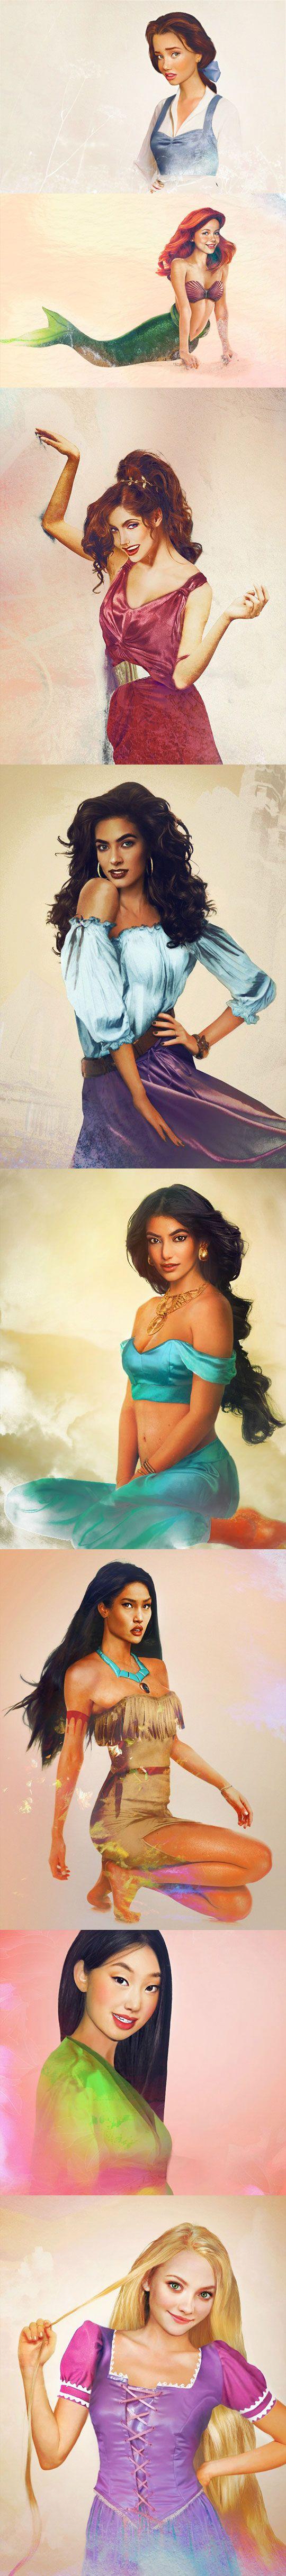 Disney Princesses Brought to Life